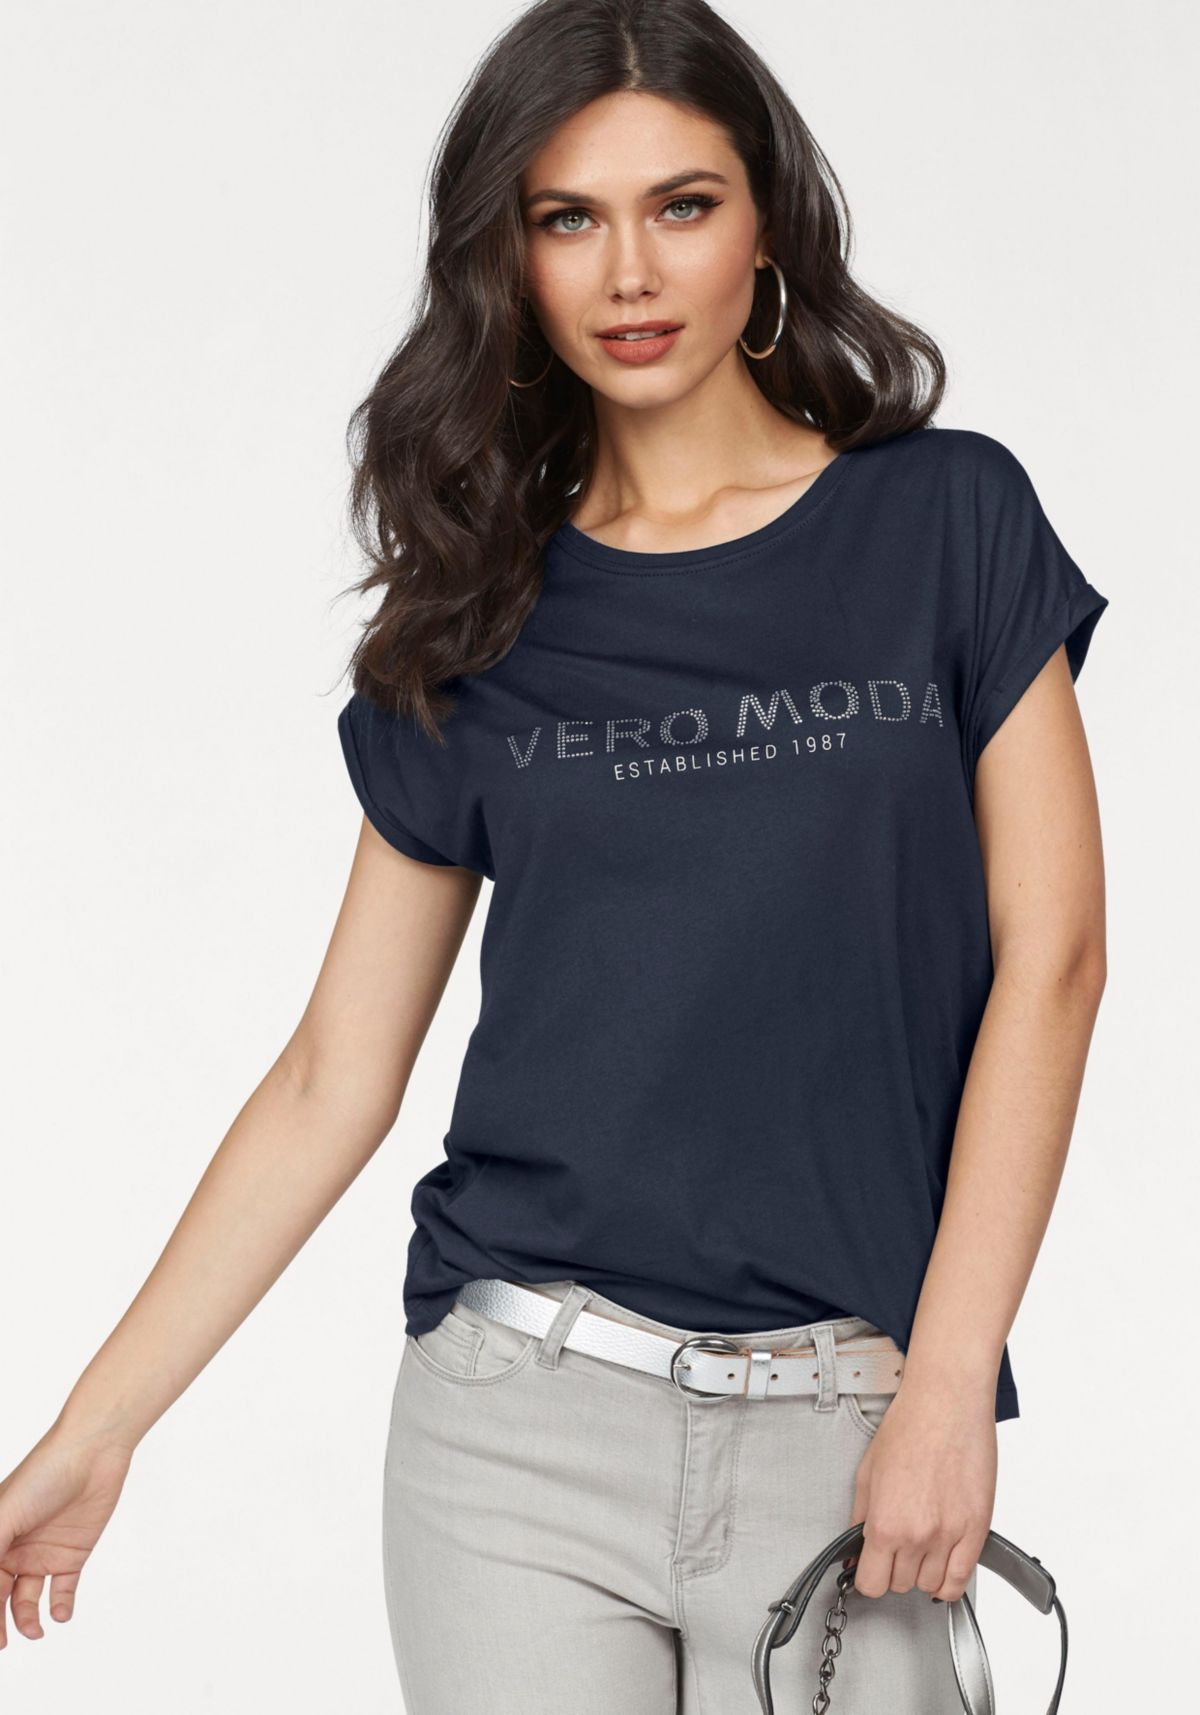 Vero Moda Rundhalsshirt »VERO«